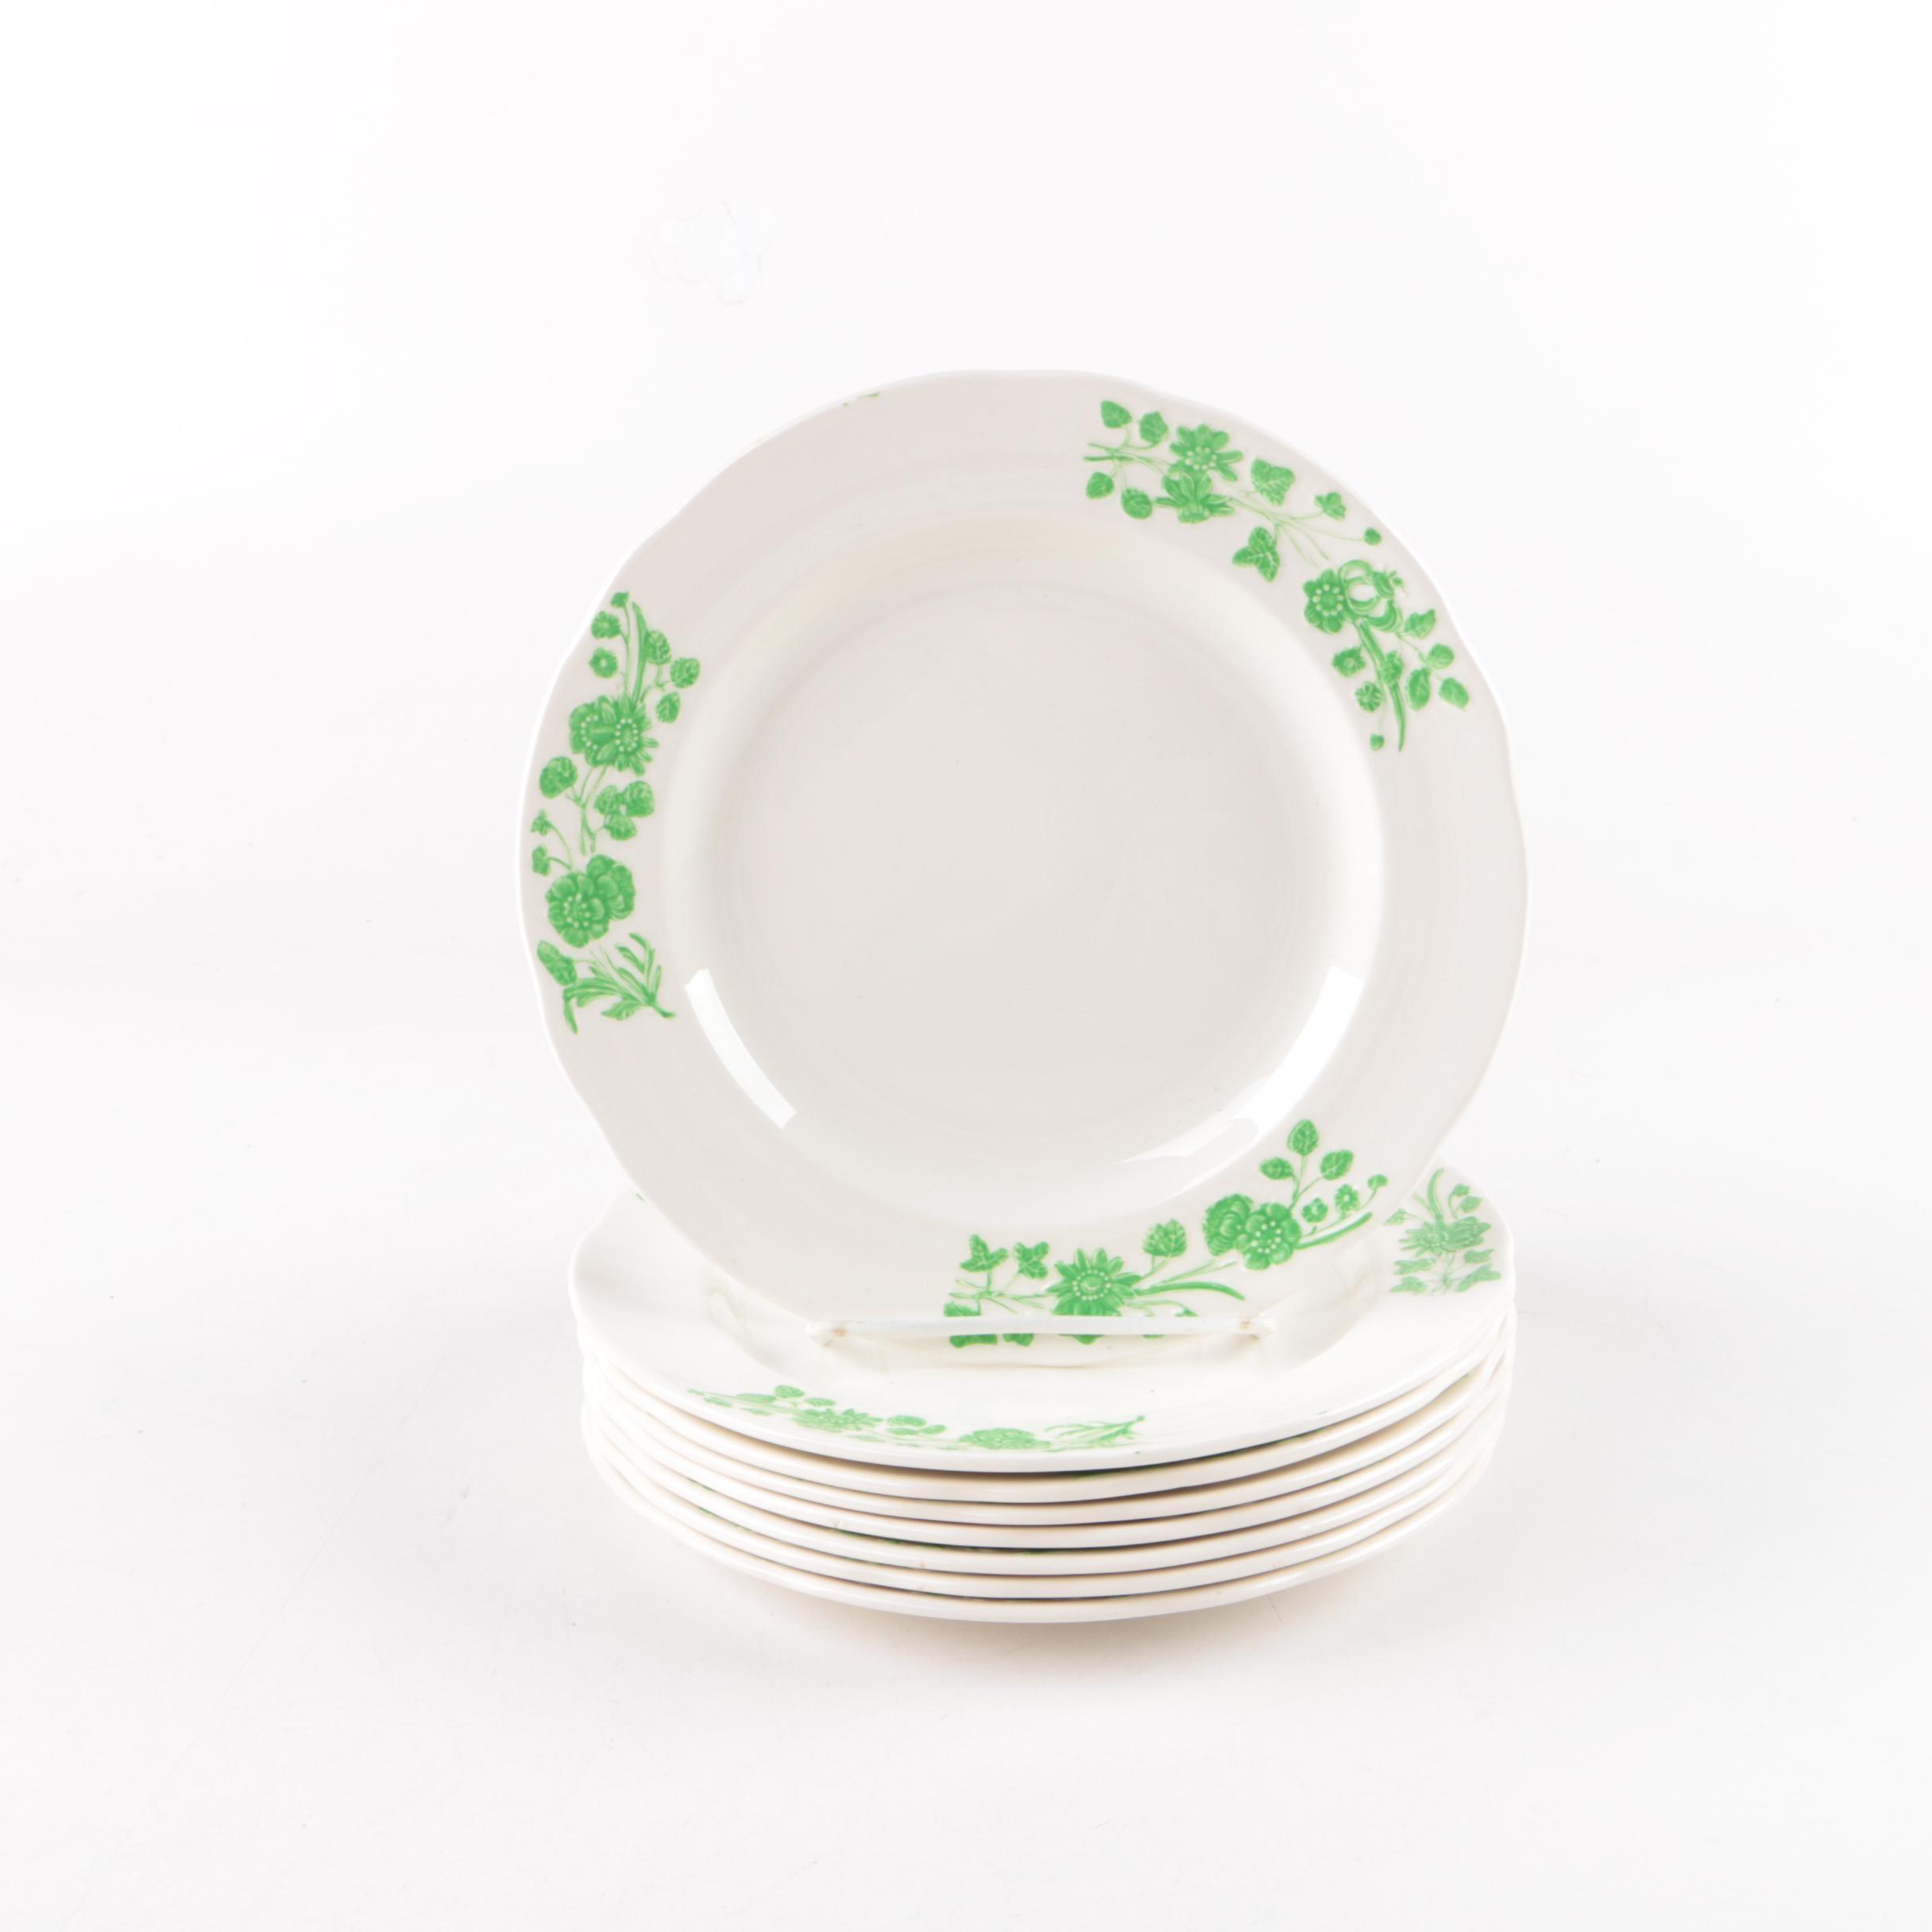 "Copeland Spode ""Shamrock"" Porcelain Plates"